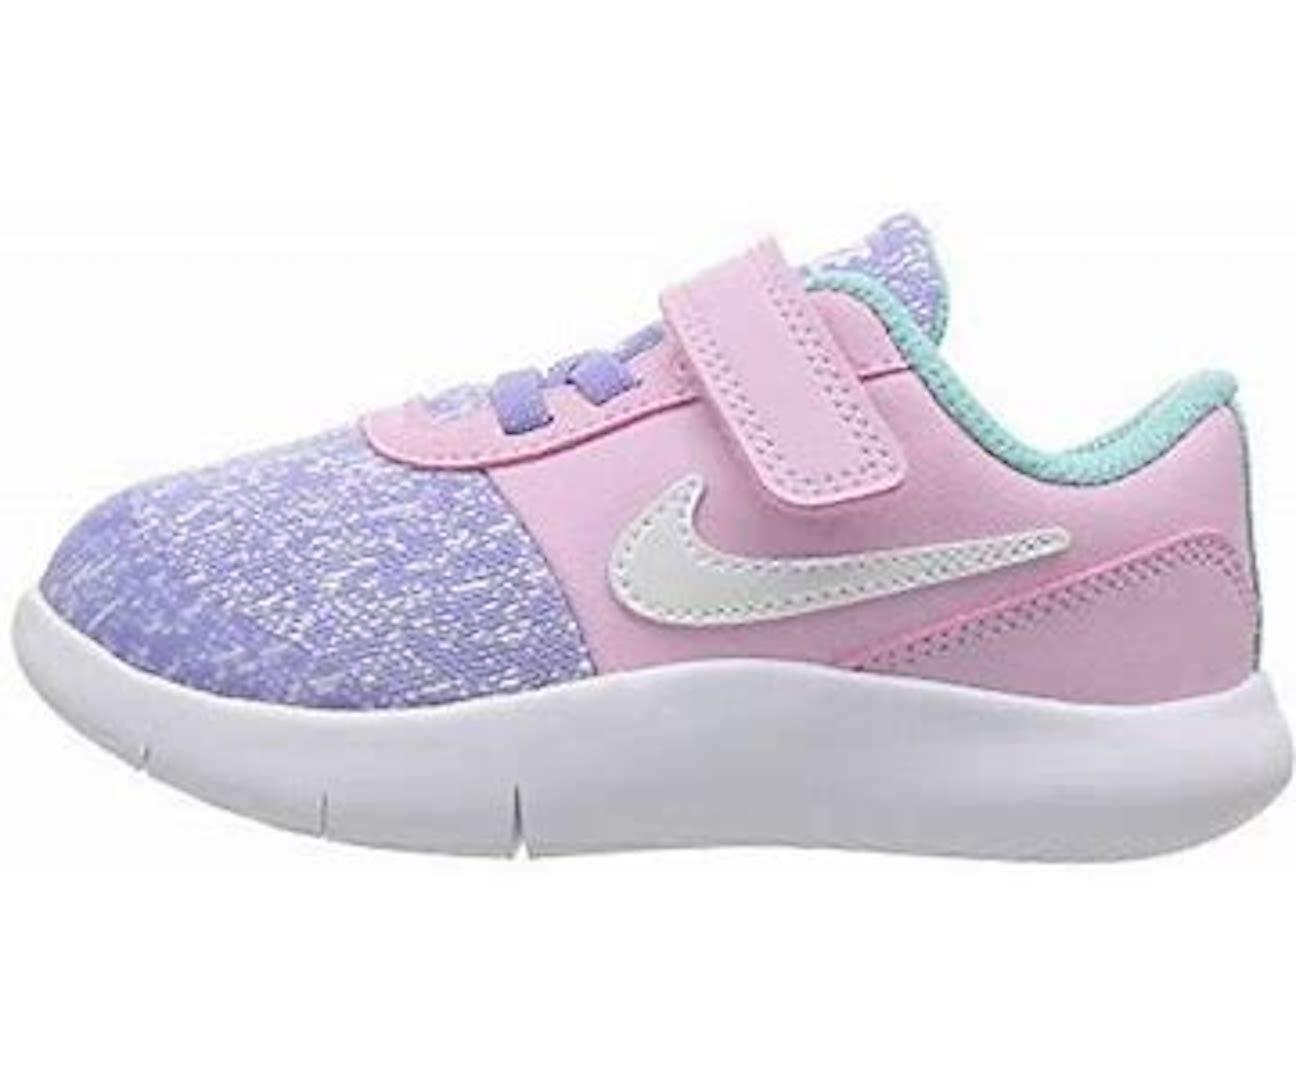 Nike Girls 4-10 Flex Contact Unicorn Sneakers